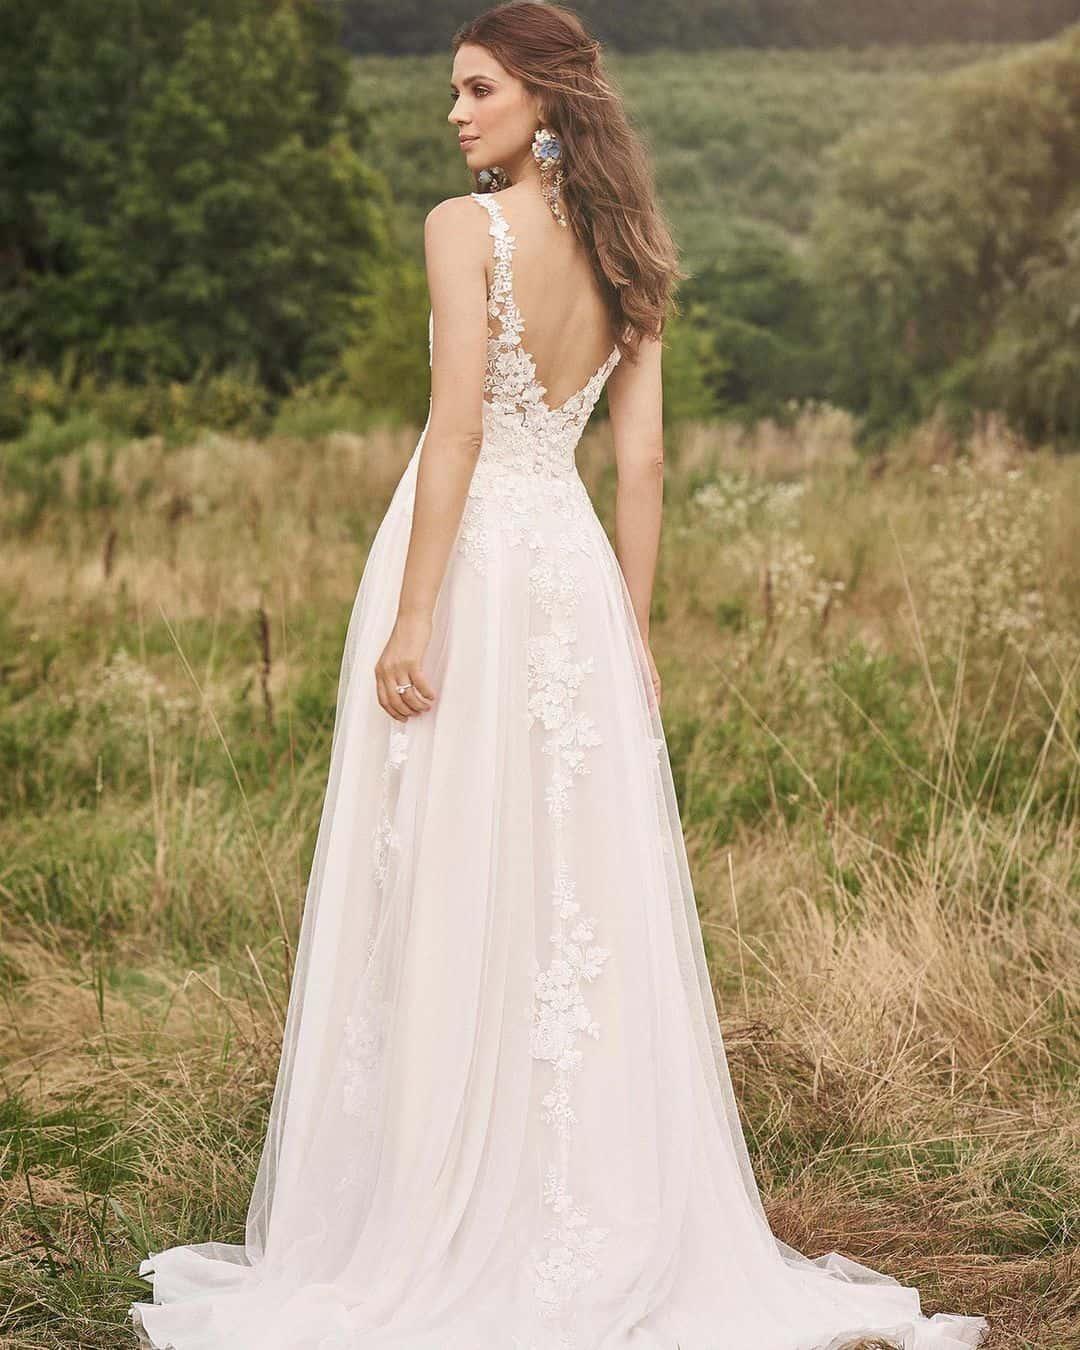 Vestido de noiva para casamento no campo.